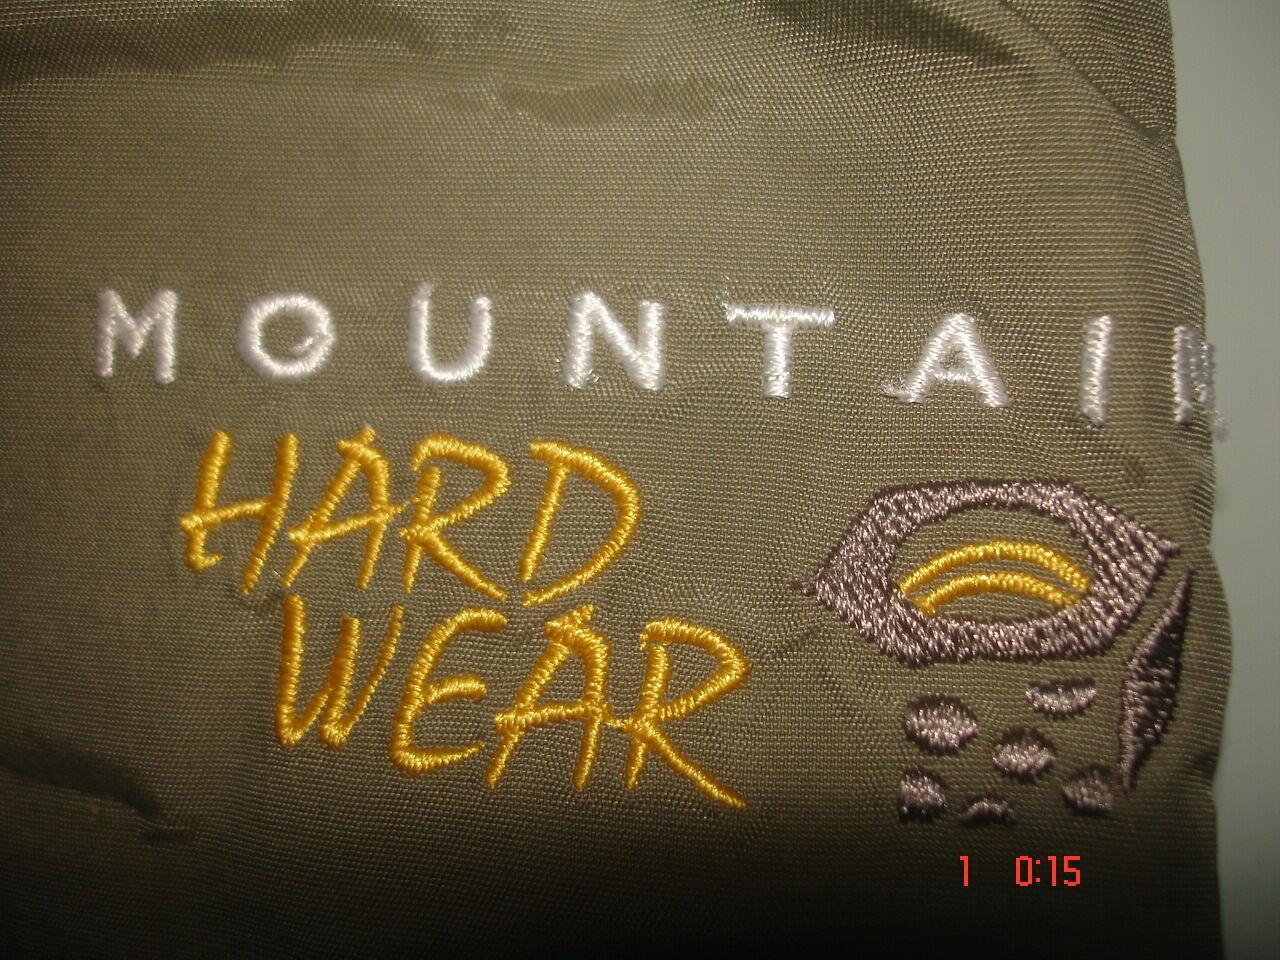 MOUNTAIN HARD WEAR CONDUIT  HERREN WINTER SKI SKI SKI HOSE Gr.XL.wie neu.NP399euro. 4ccf25